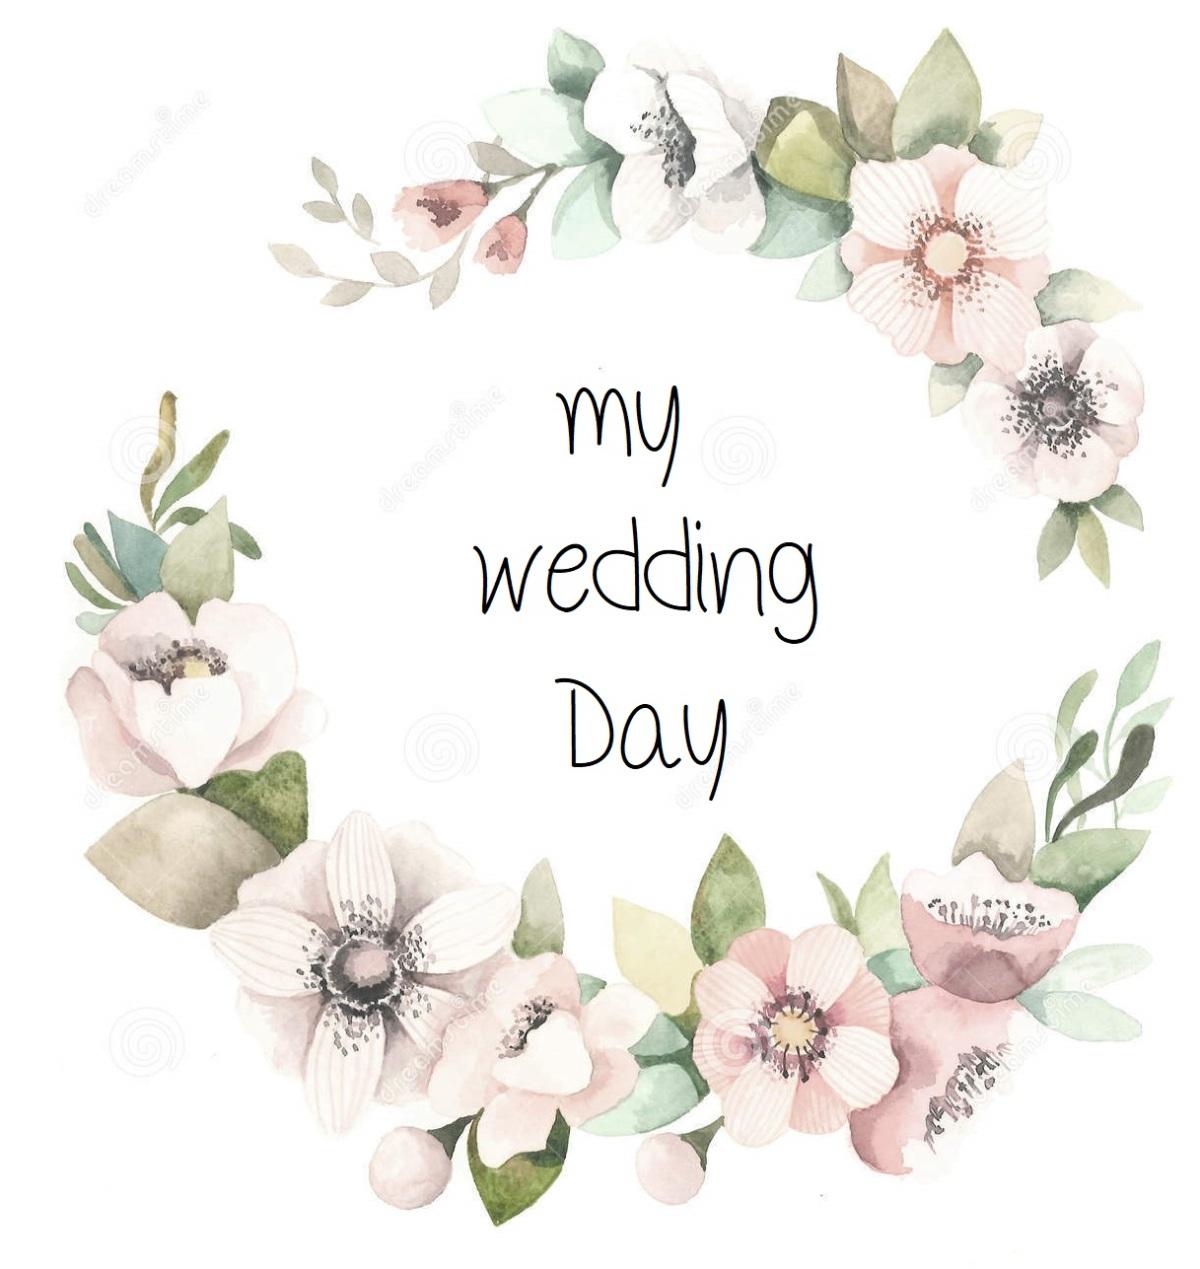 9.11.19: My WeddingDay